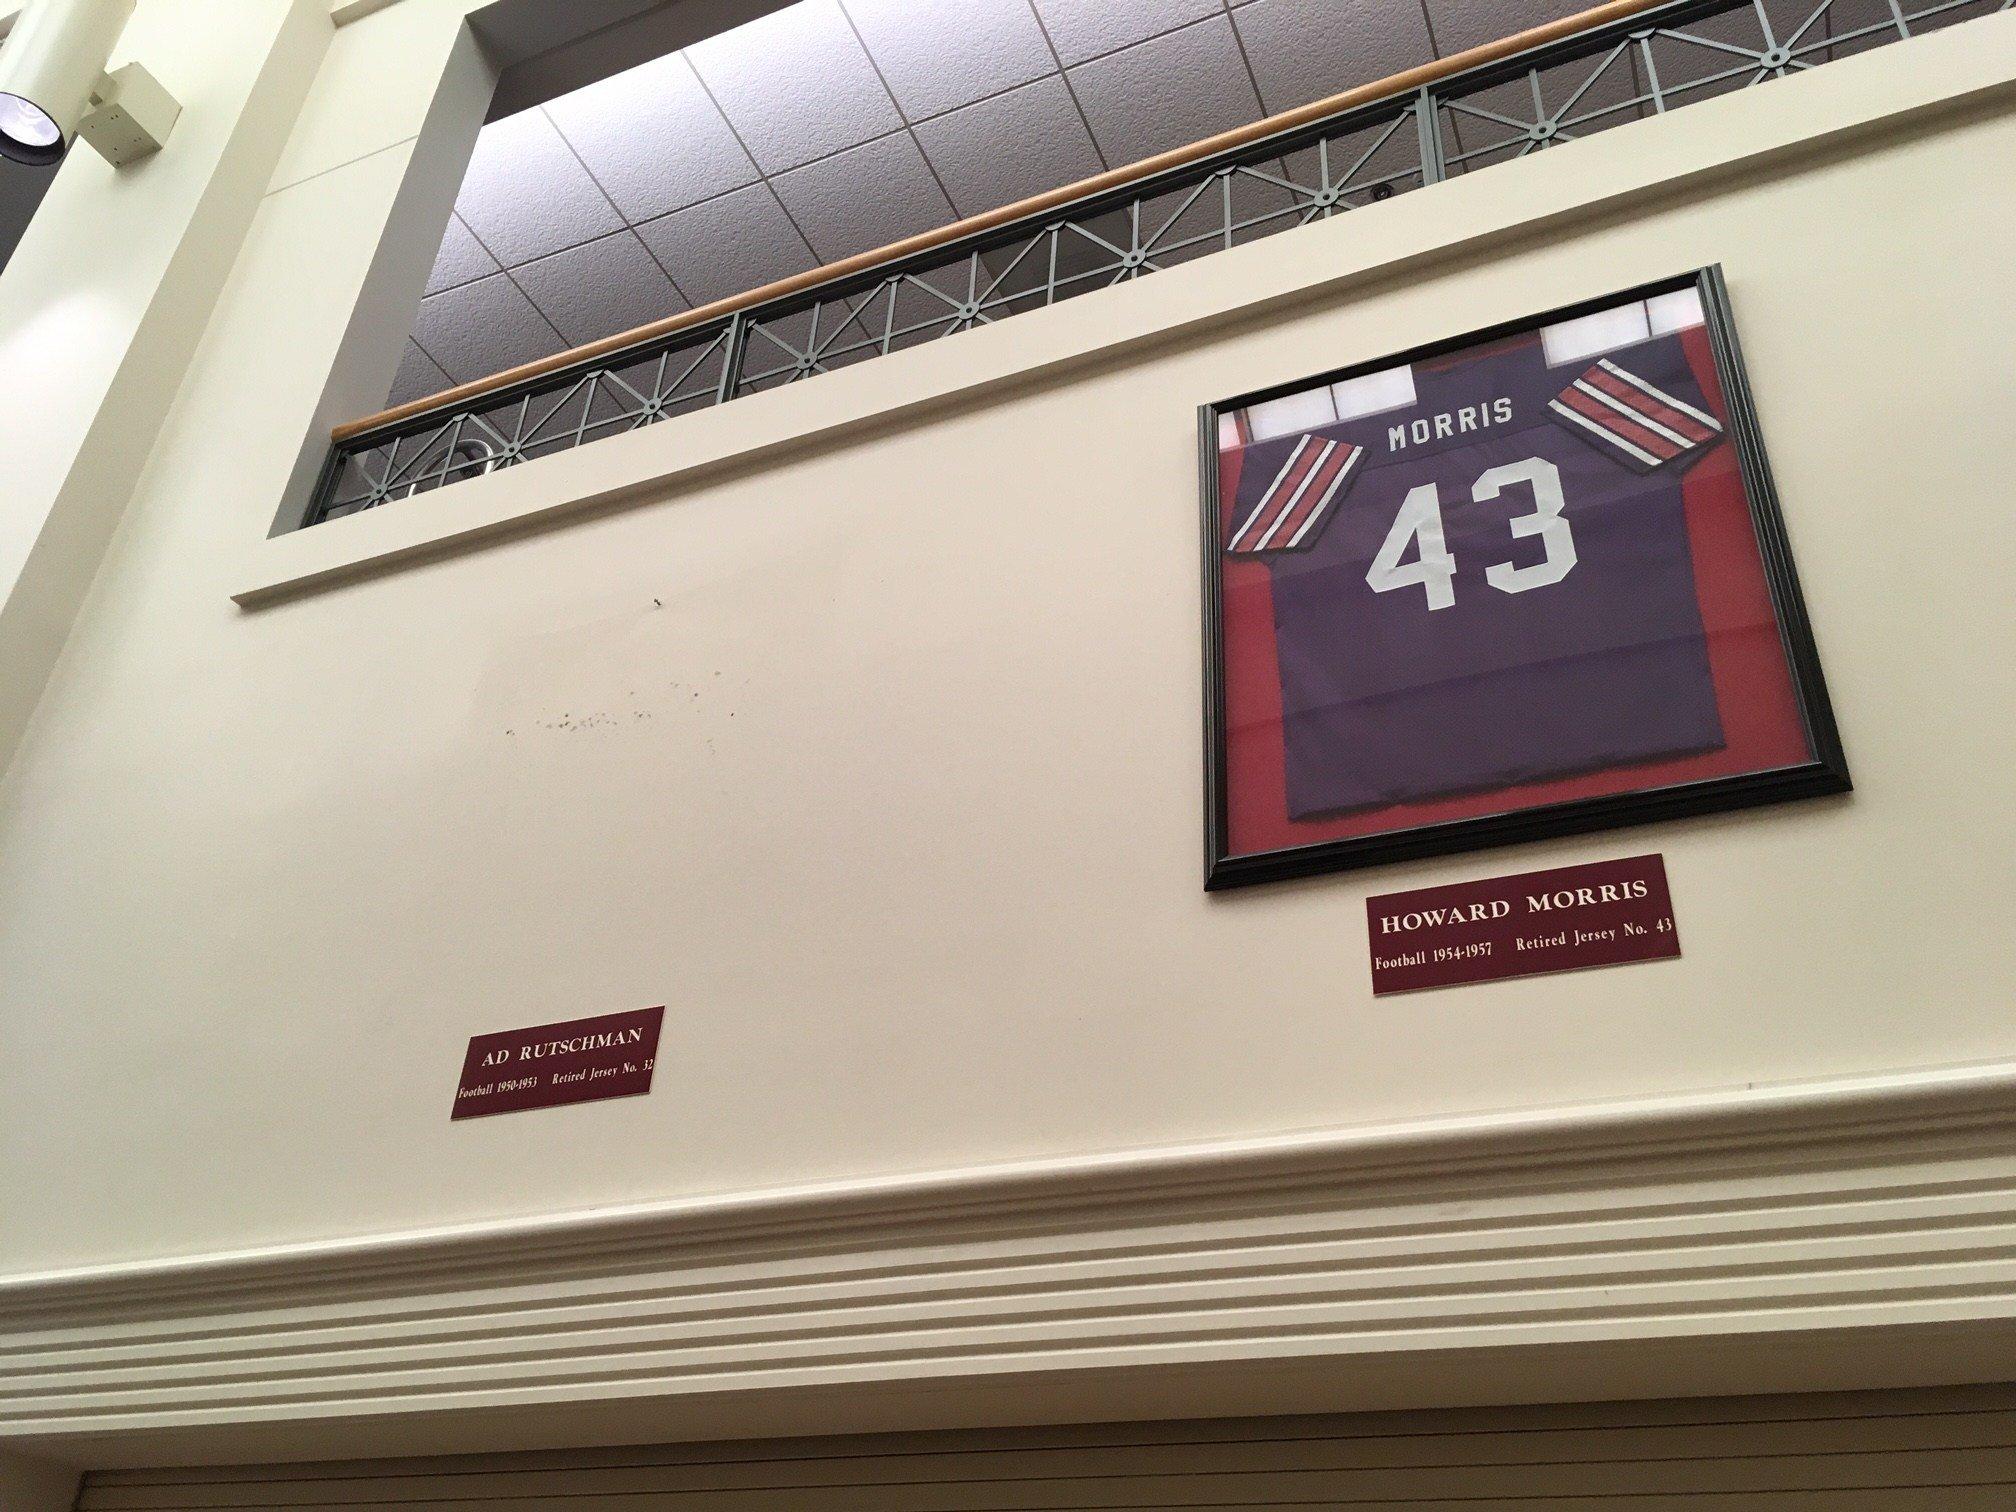 The empty spot where Rutschman's retired jersey hung.